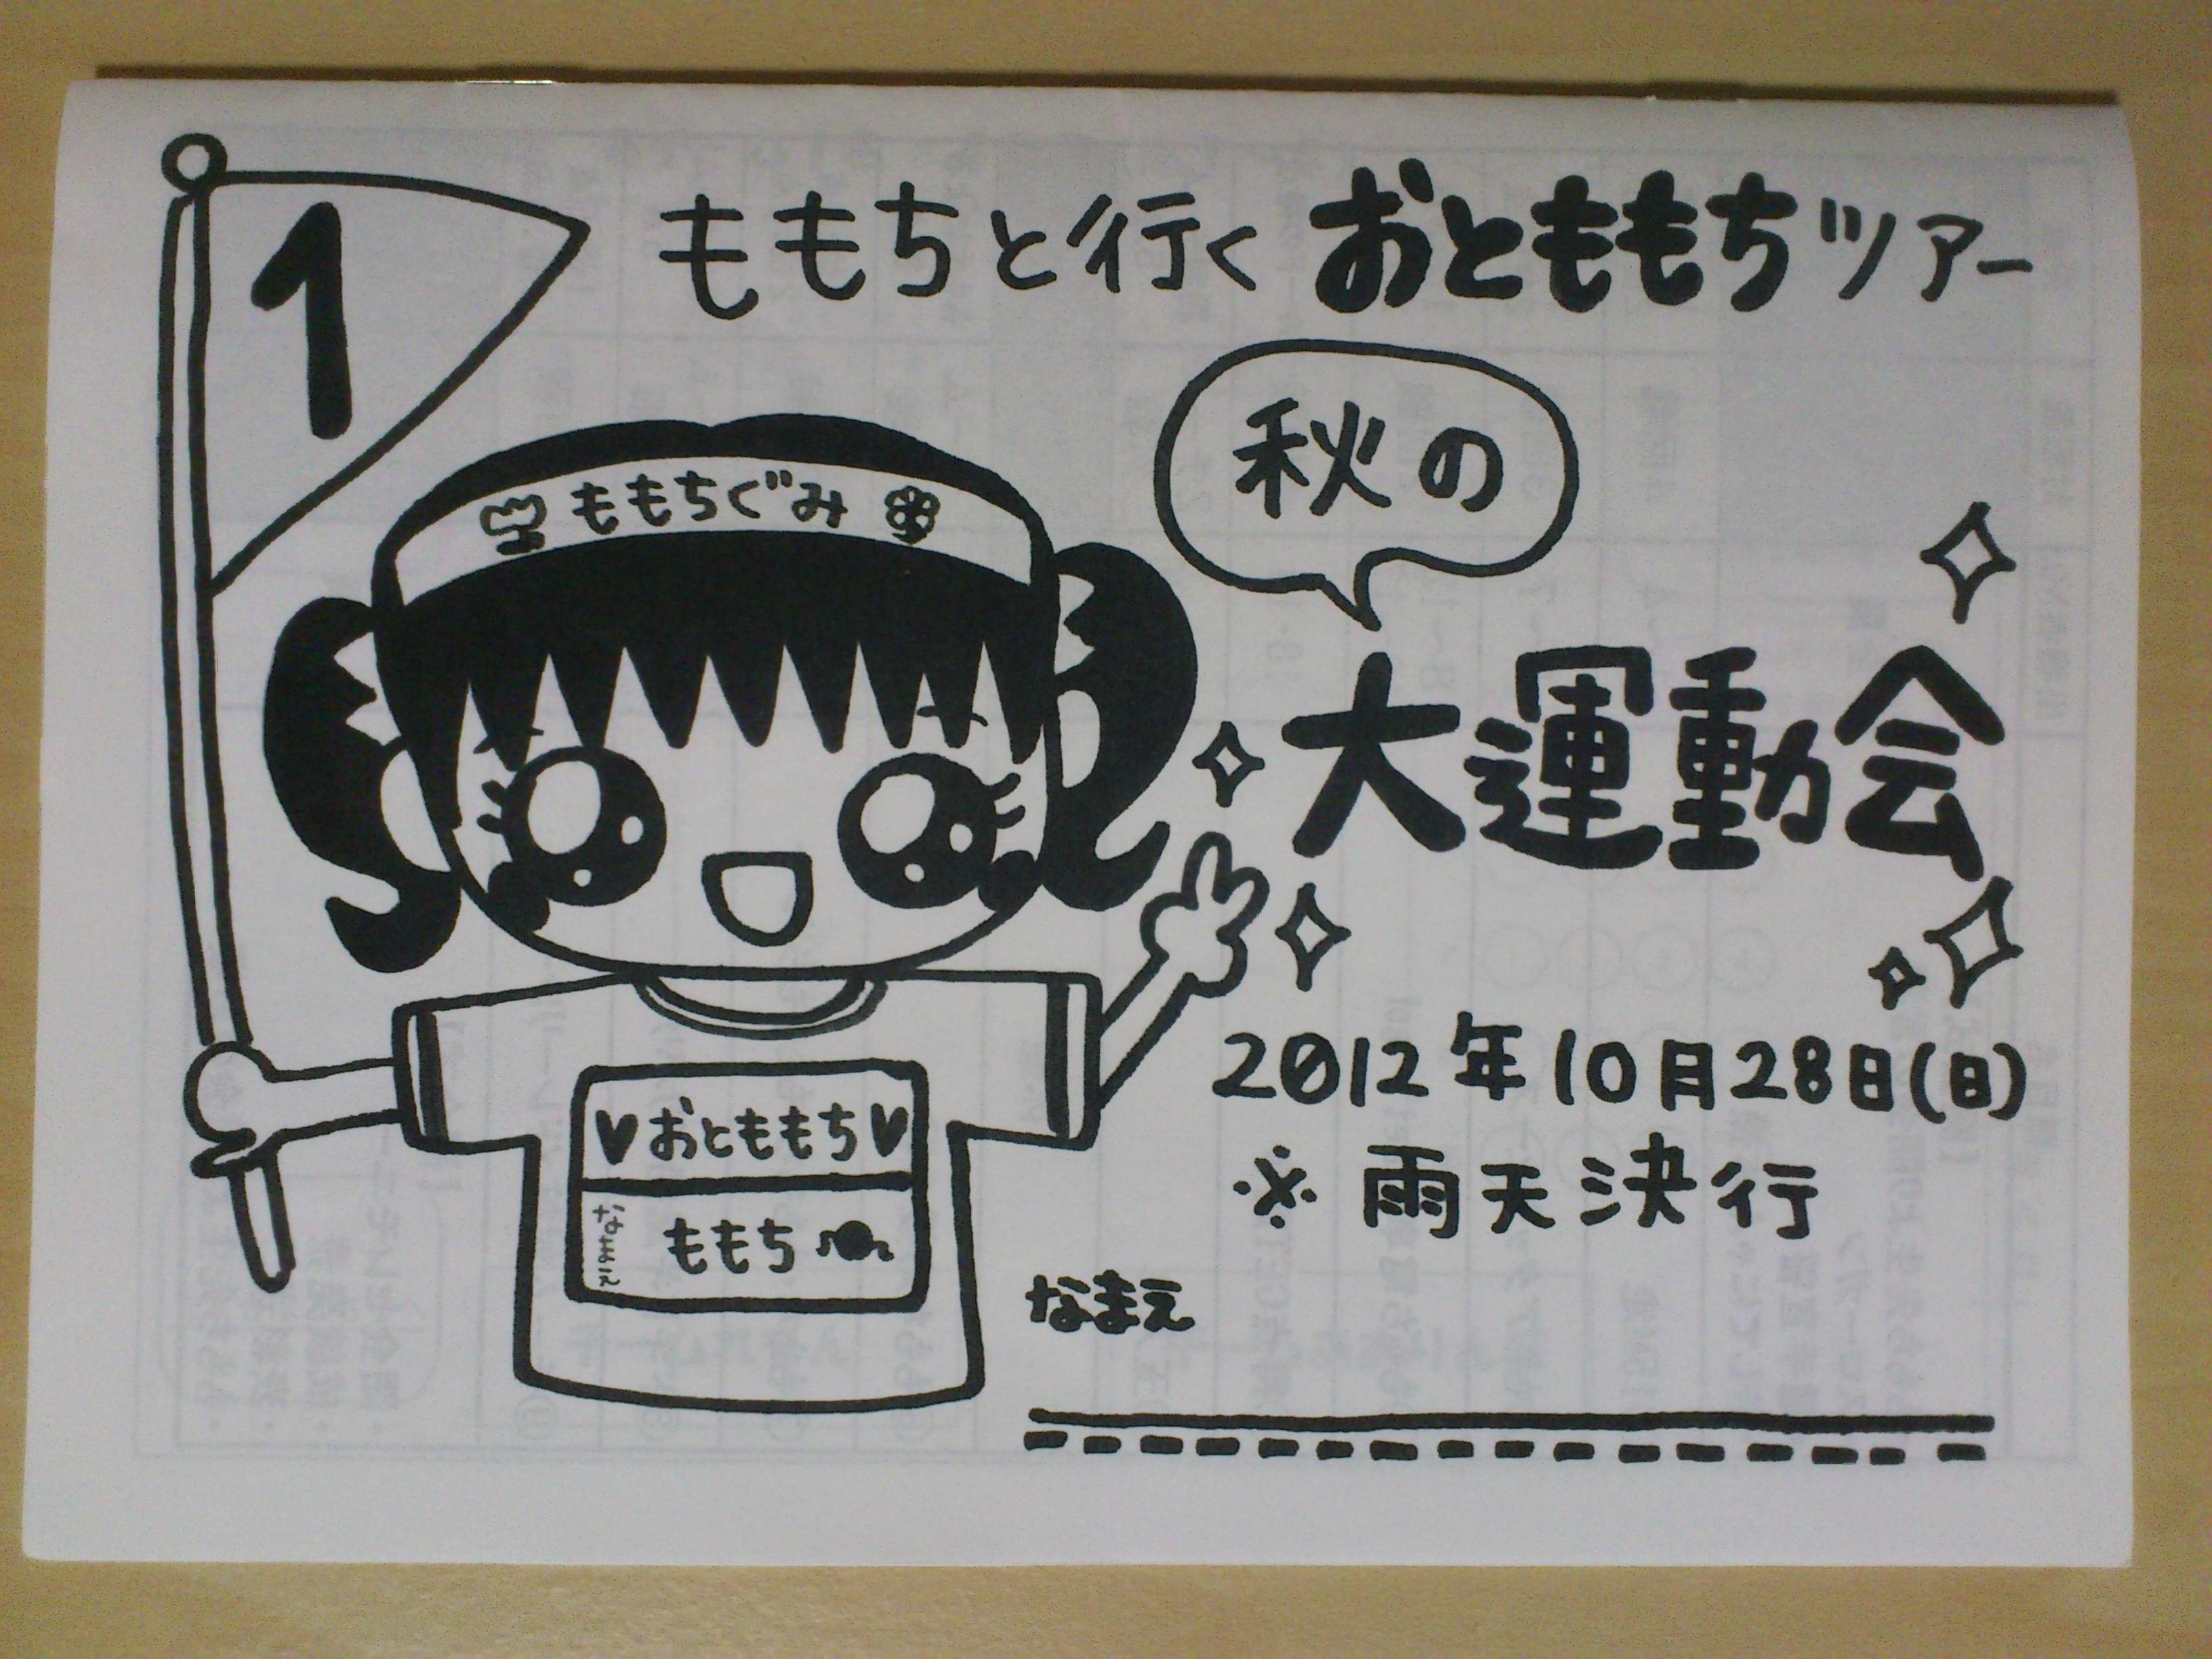 f:id:kasukabe:20121110161702j:plain:w350